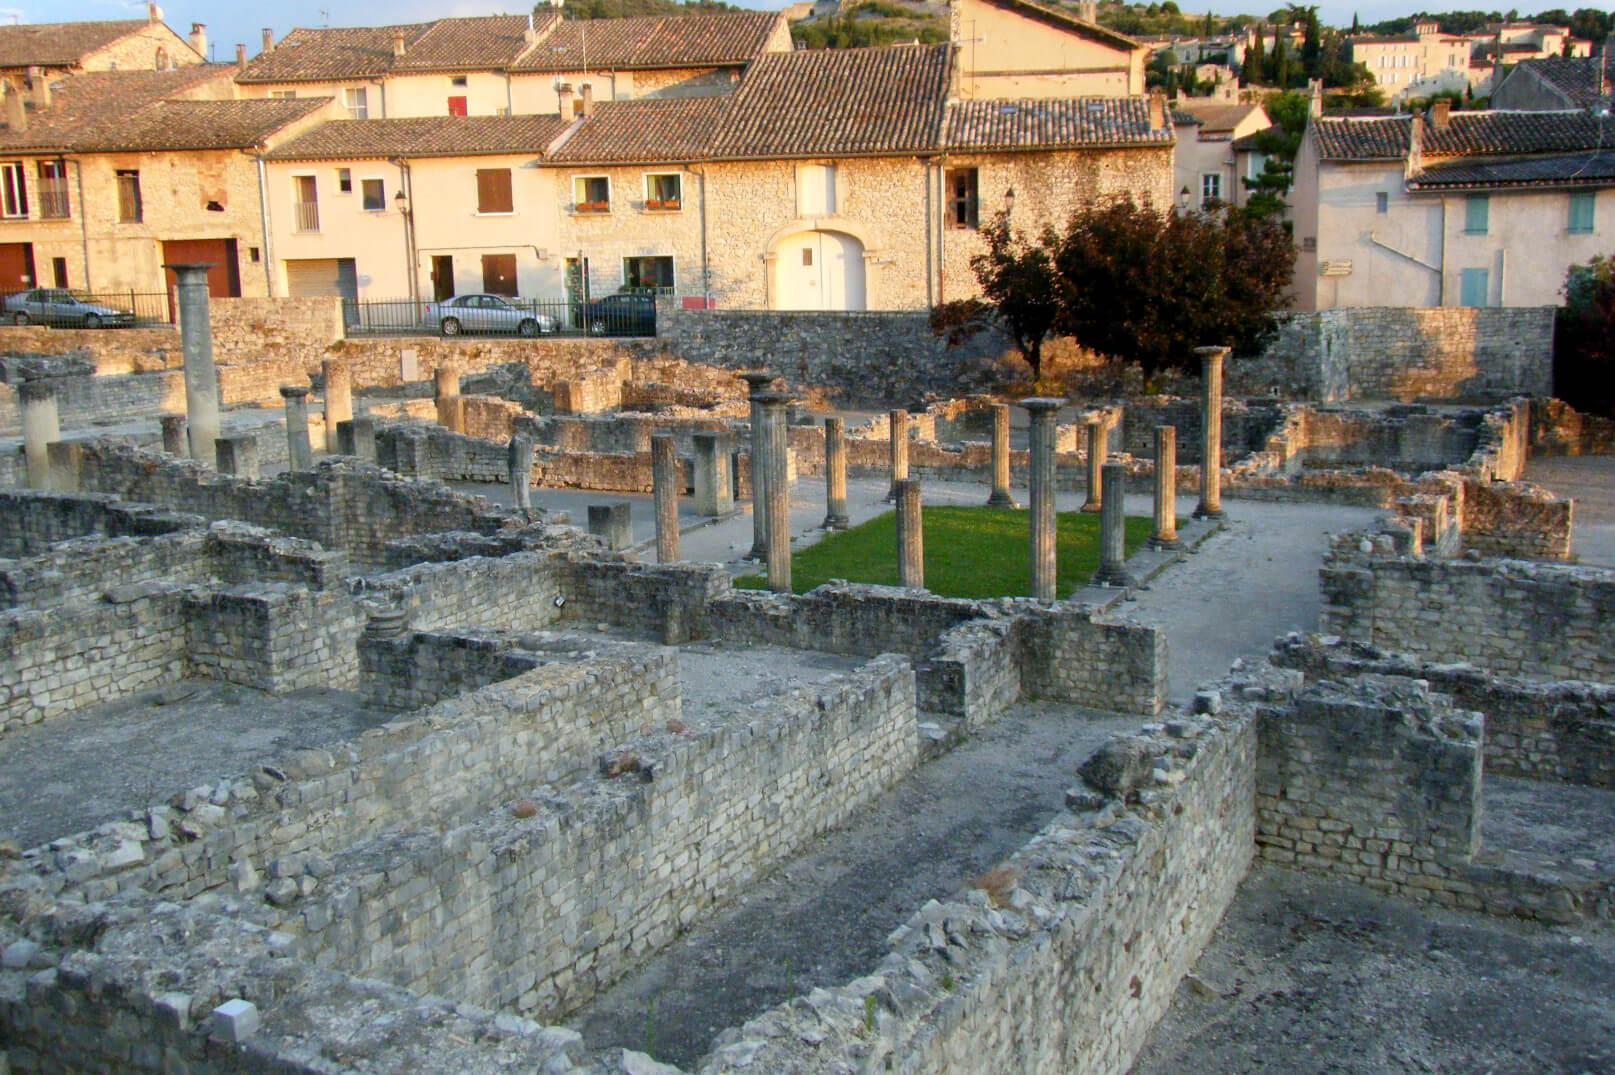 Spaziergang durch antike Stätten